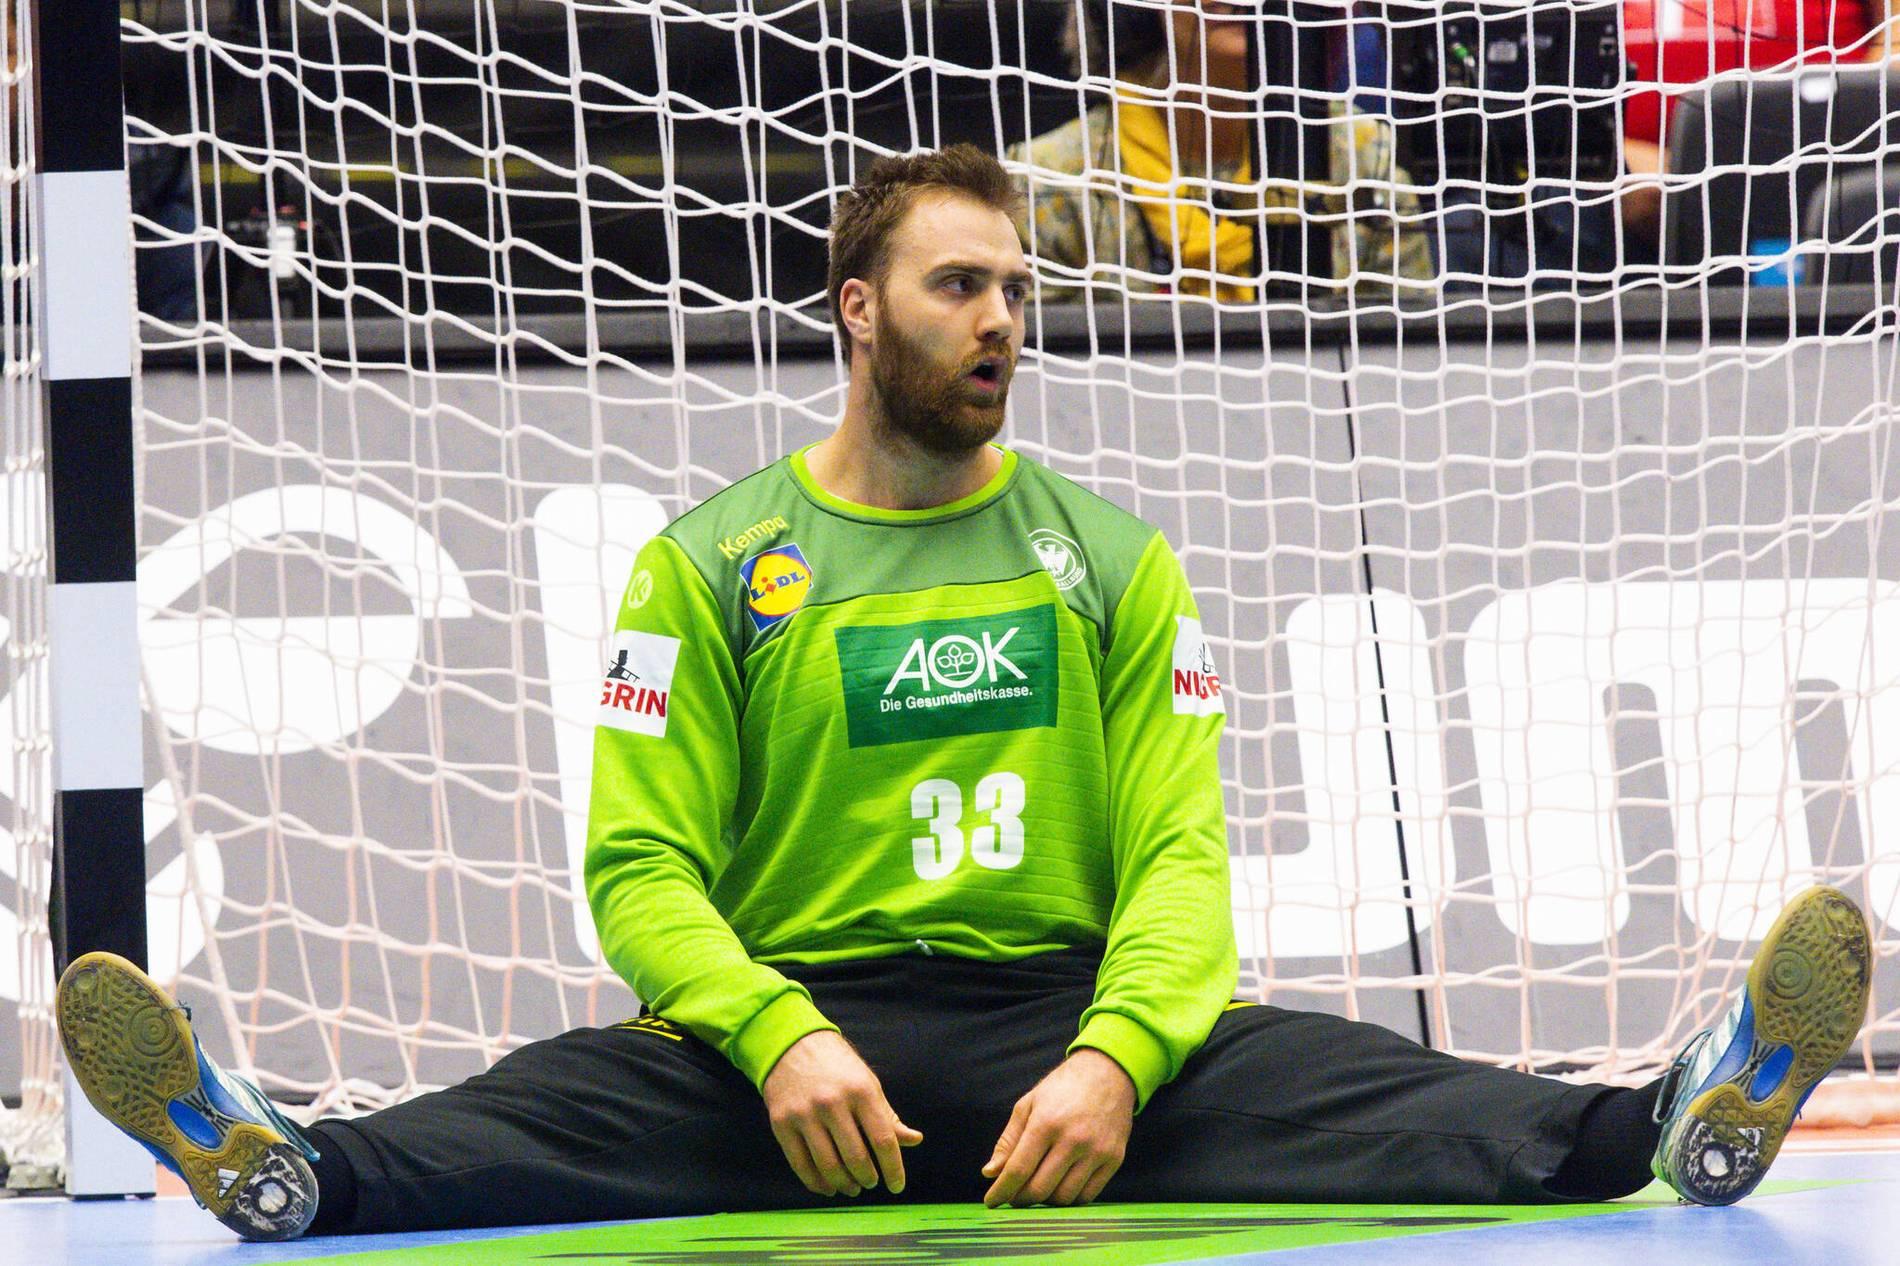 Handball Wolff